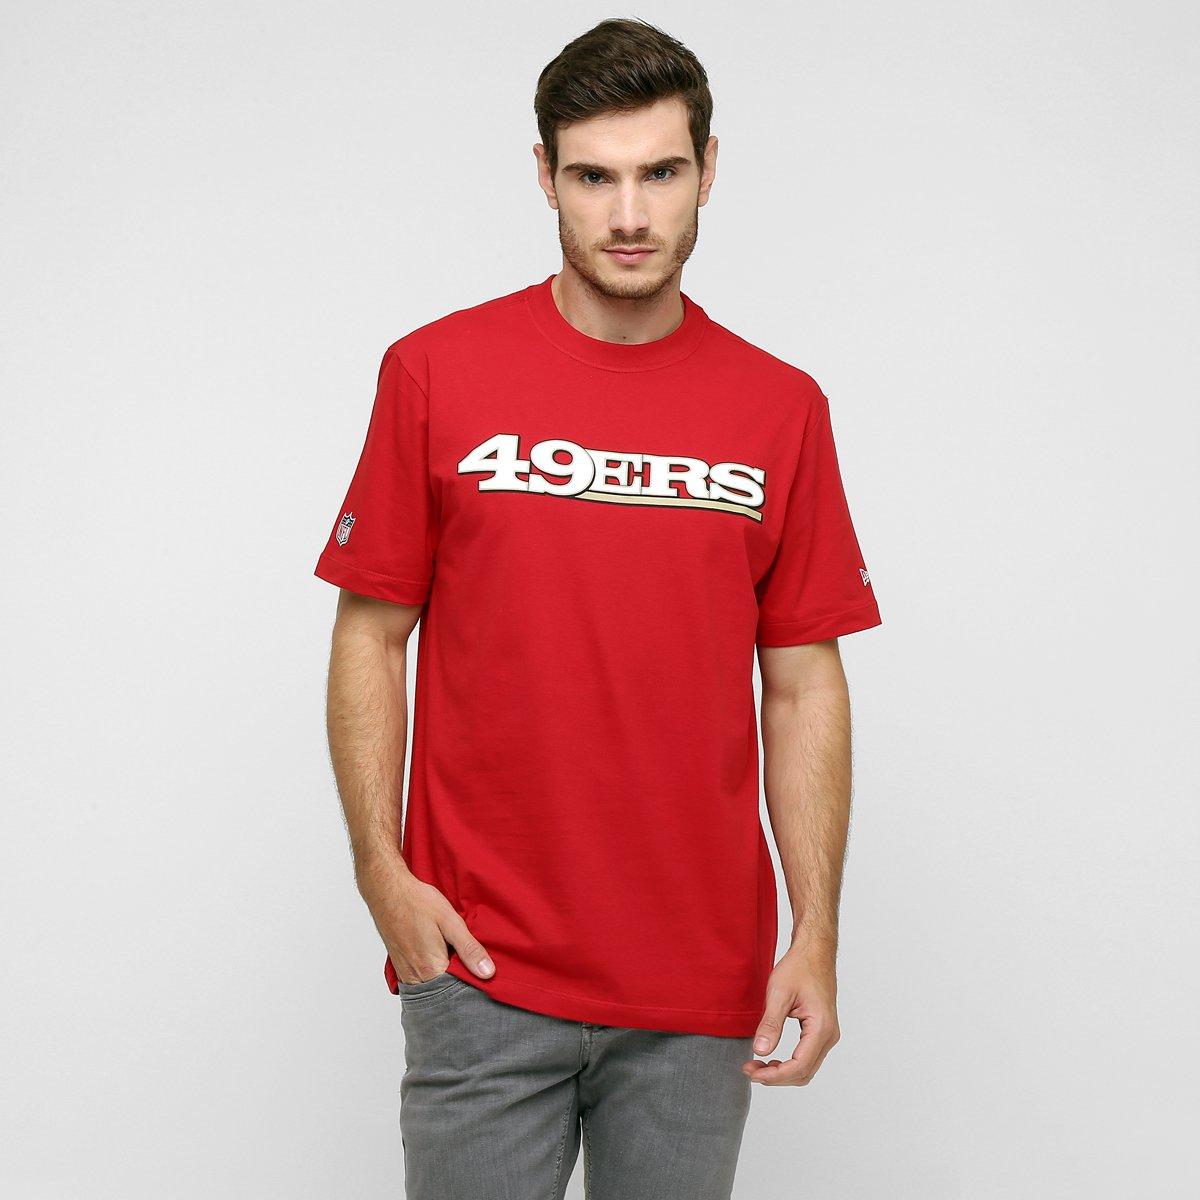 0ec9bc2152925 Camiseta New Era NFL Newperm San Francisco 49Ers - Compre Agora ...